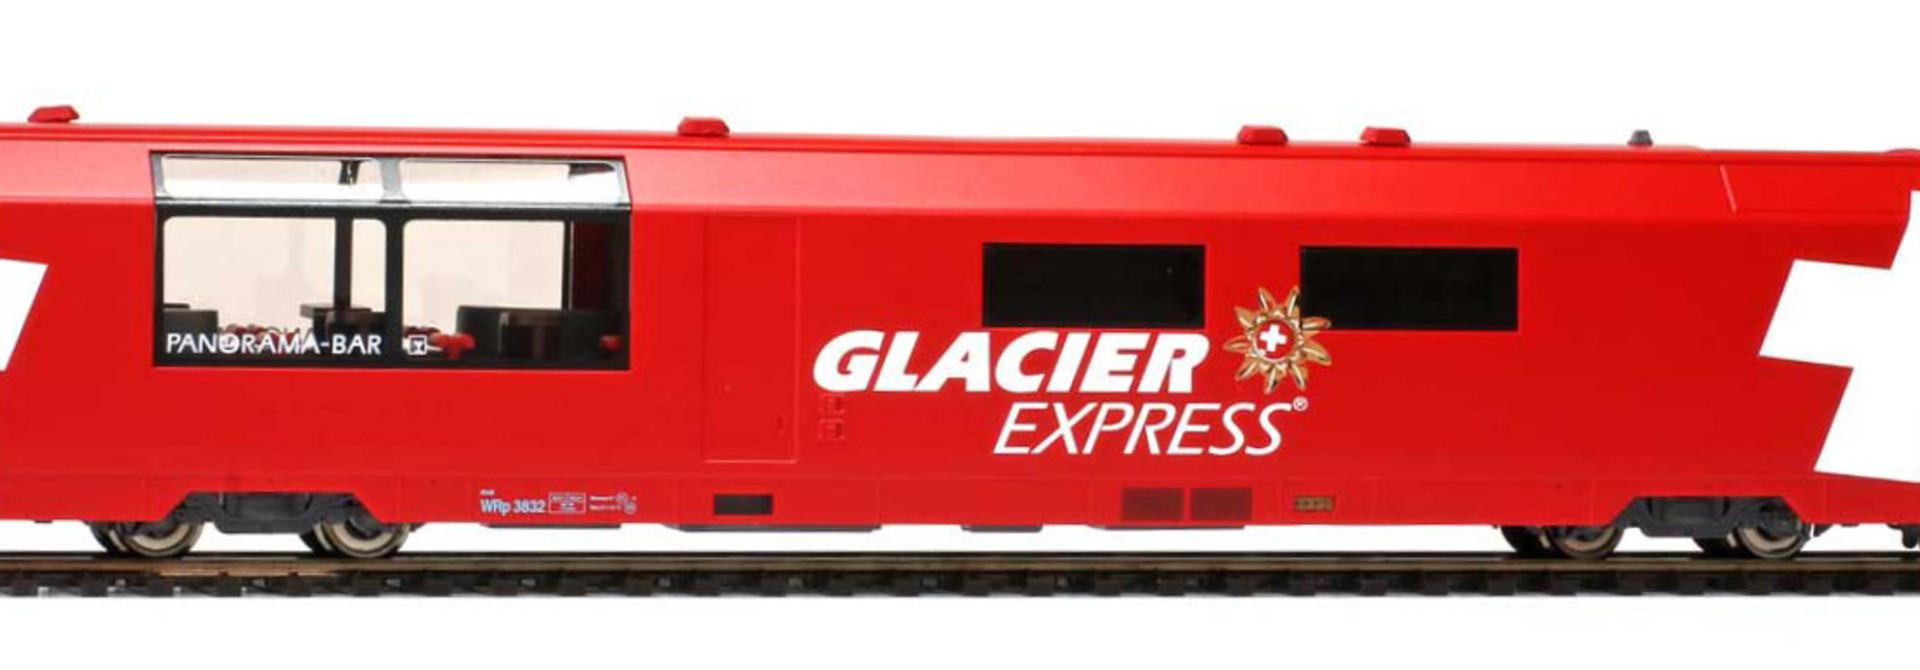 "3589132 RhB WRp 3832 ""Glacier Express"" H0 3L-WS"